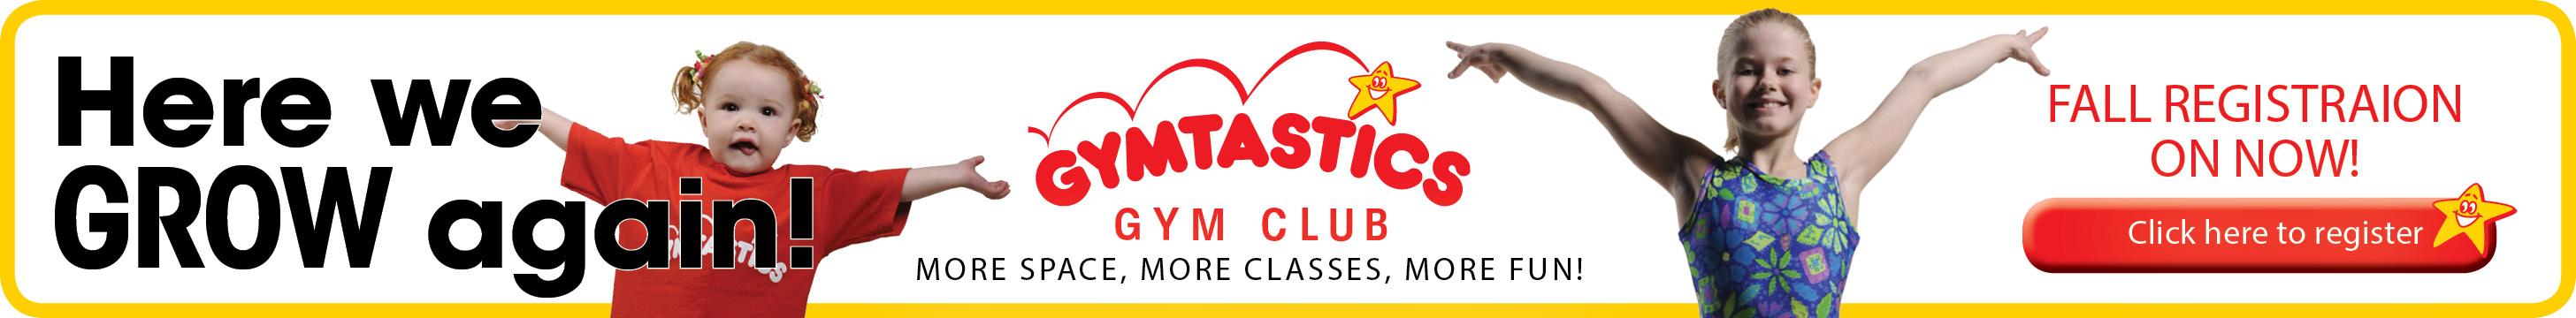 Gymtastics Sep 2017